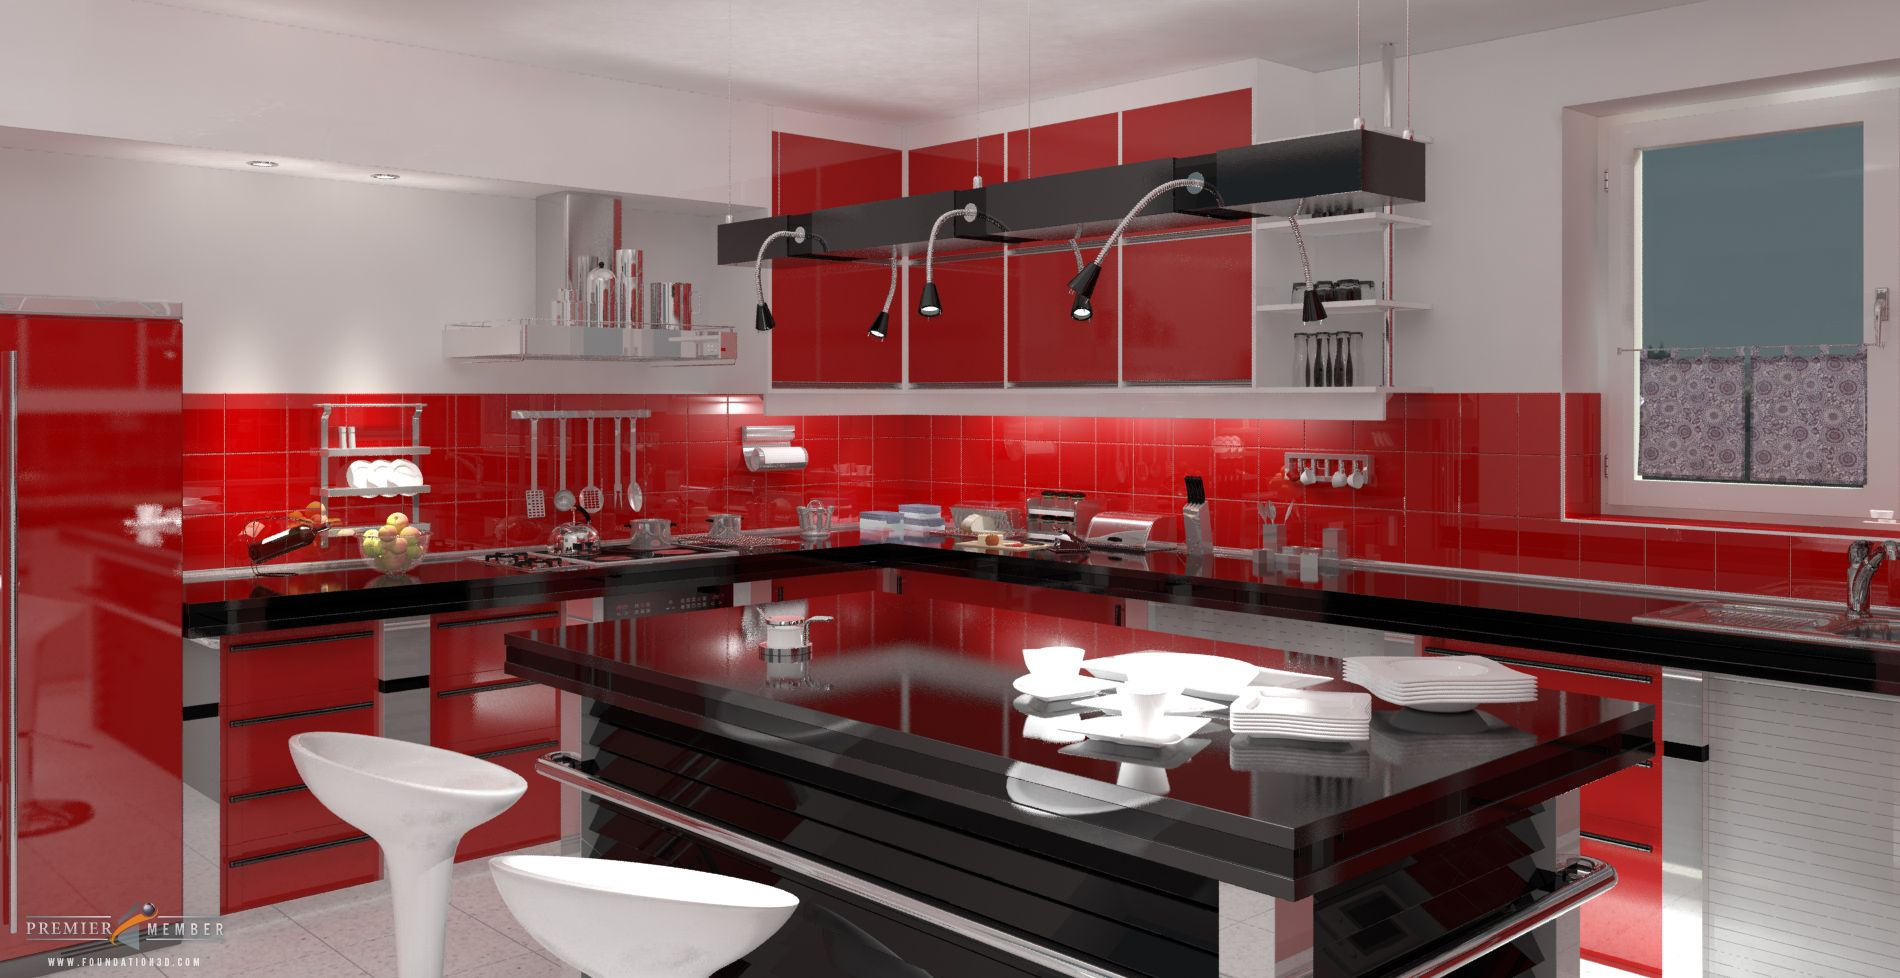 Good Looking Architecture Red Kitchen Jpg 1900 978 Kitchen Colors Red Kitchen Decor Kitchen Design Decor